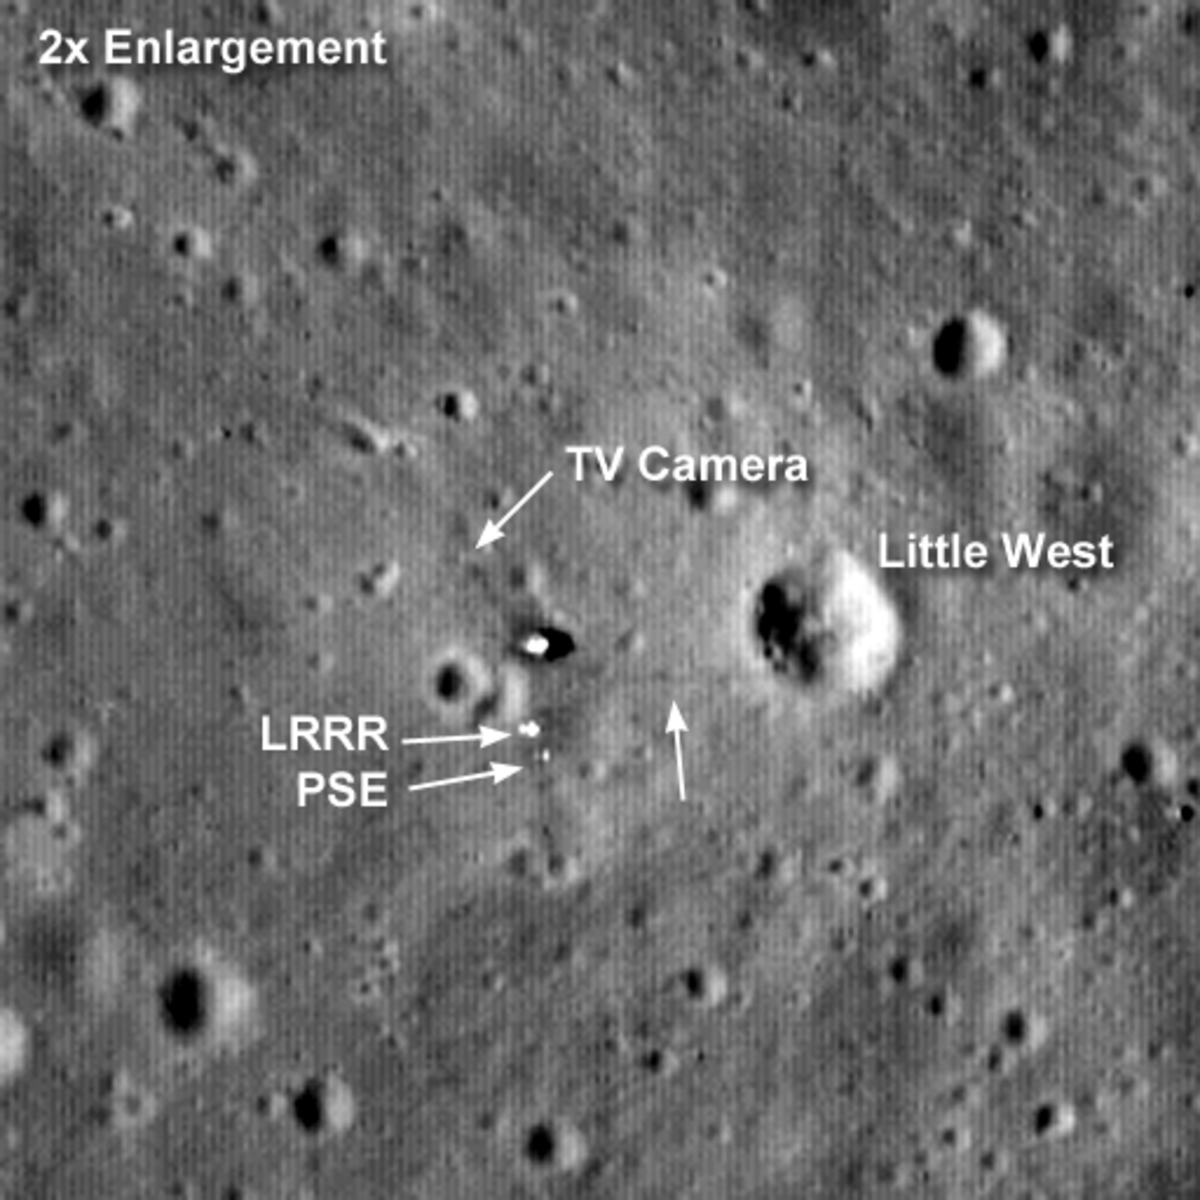 apollo tracks on moon - photo #11